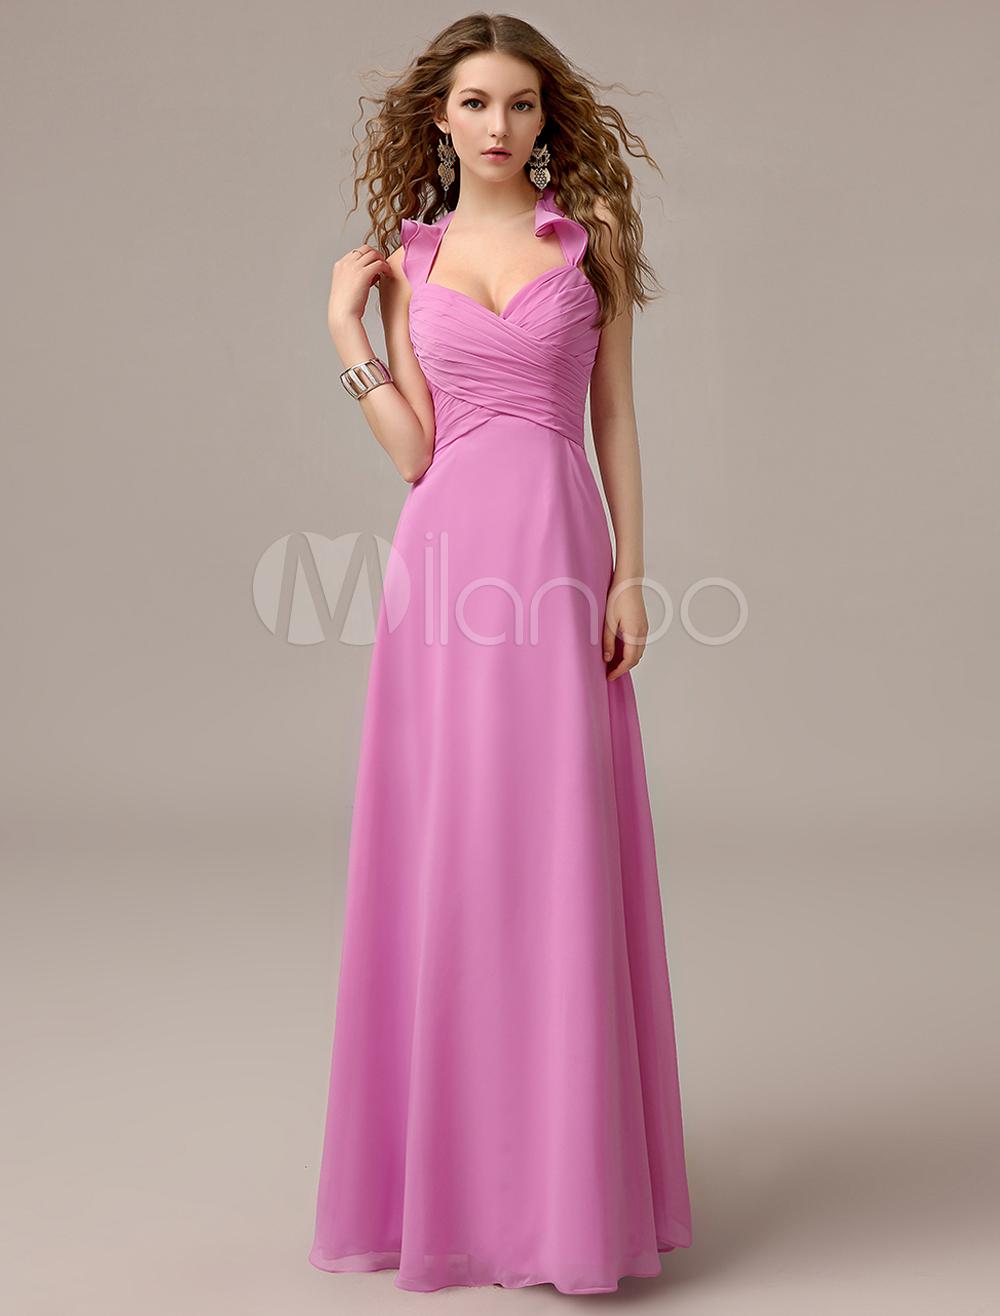 Fuchsia Pink Halter Bridesmaid Dress Ruffles A Line Floor Length Chiffon Wedding Party Dress